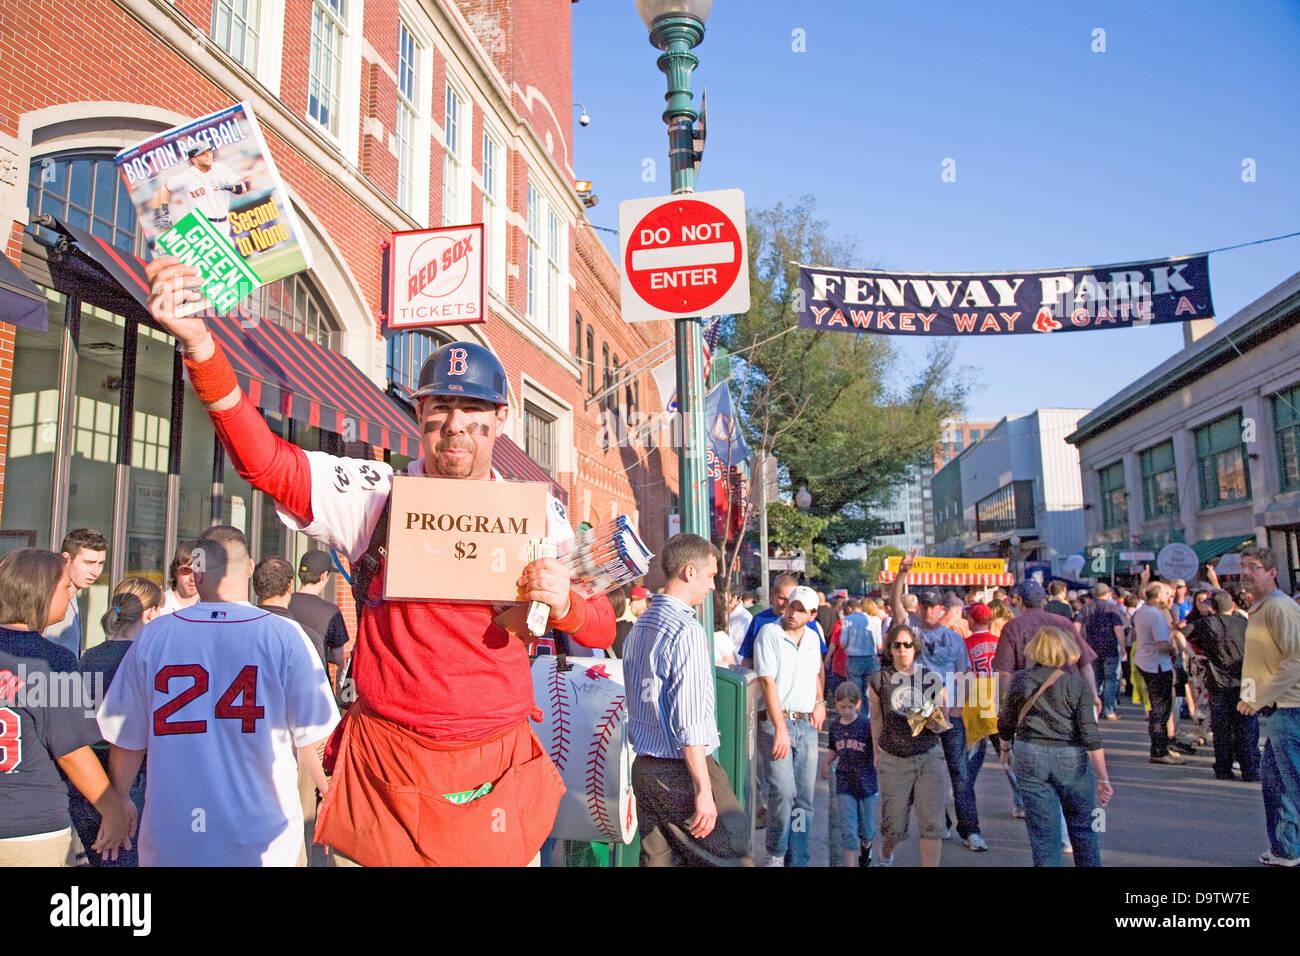 Programs $2 at historic Fenway Park Yawkey Way Gate Boston Red Sox Boston Ma USA May 20 2010 Red Sox versus Minnesota - Stock Image